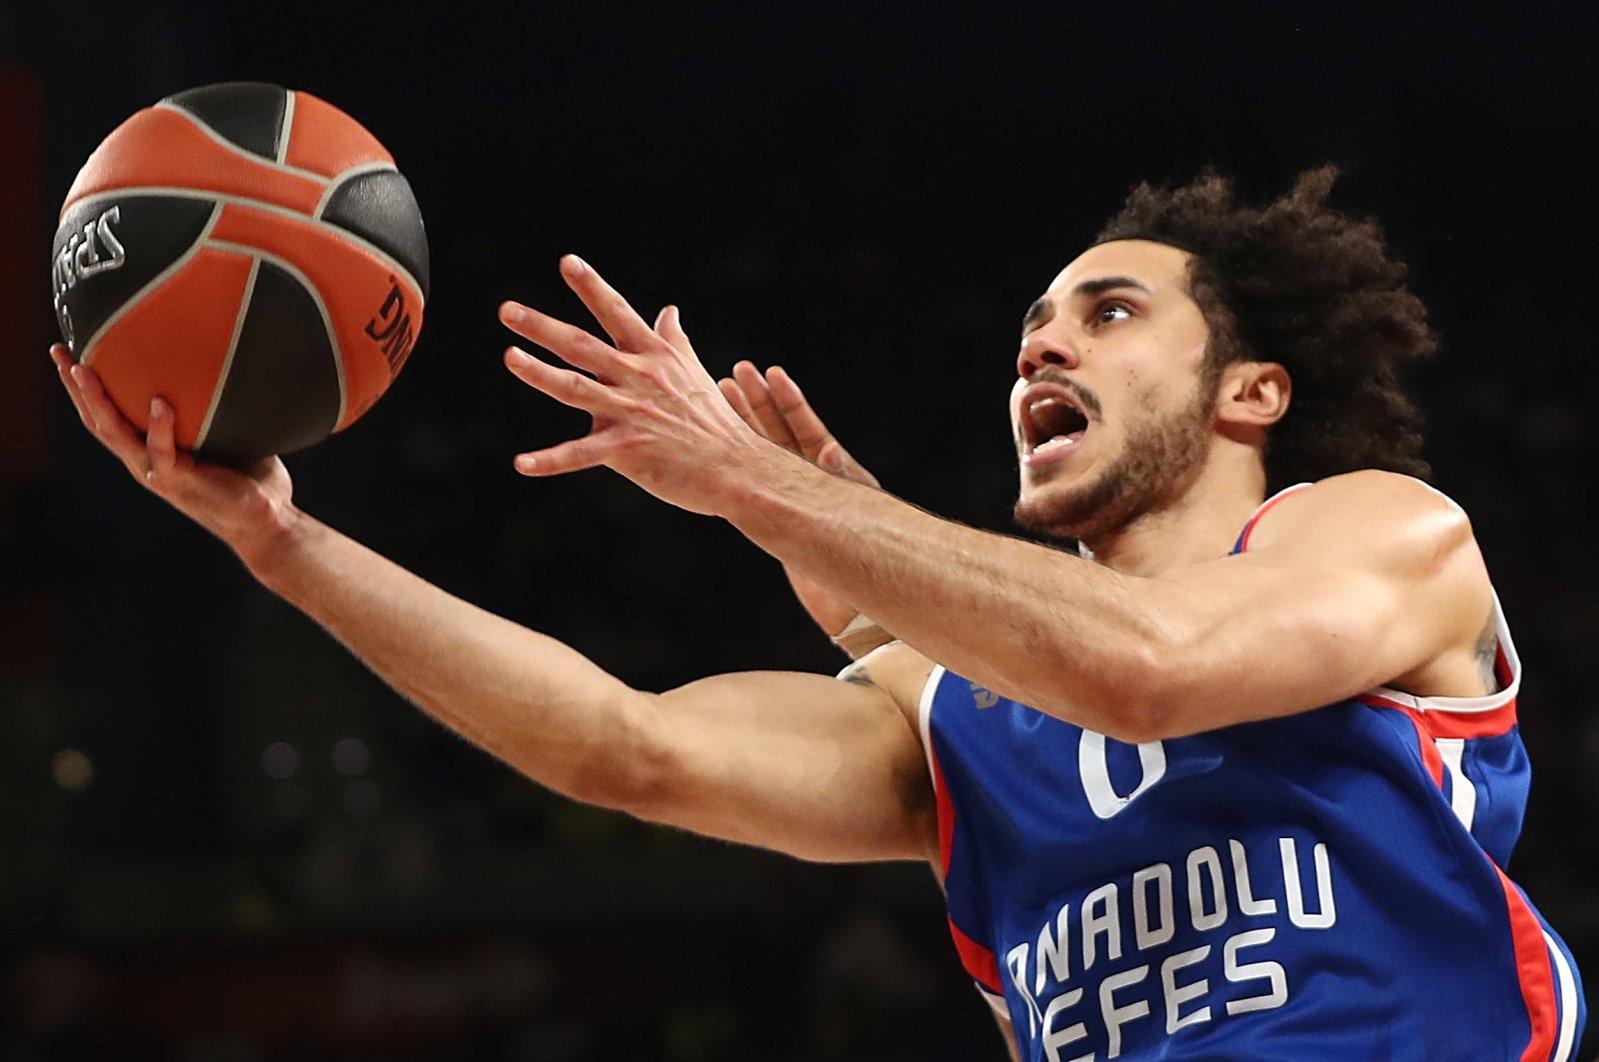 Anadolu Efes' Shane Larkin in action during a EuroLeague Final Four match, Vitoria-Gasteiz, Spain, May 19, 2019. (Reuters Photo)